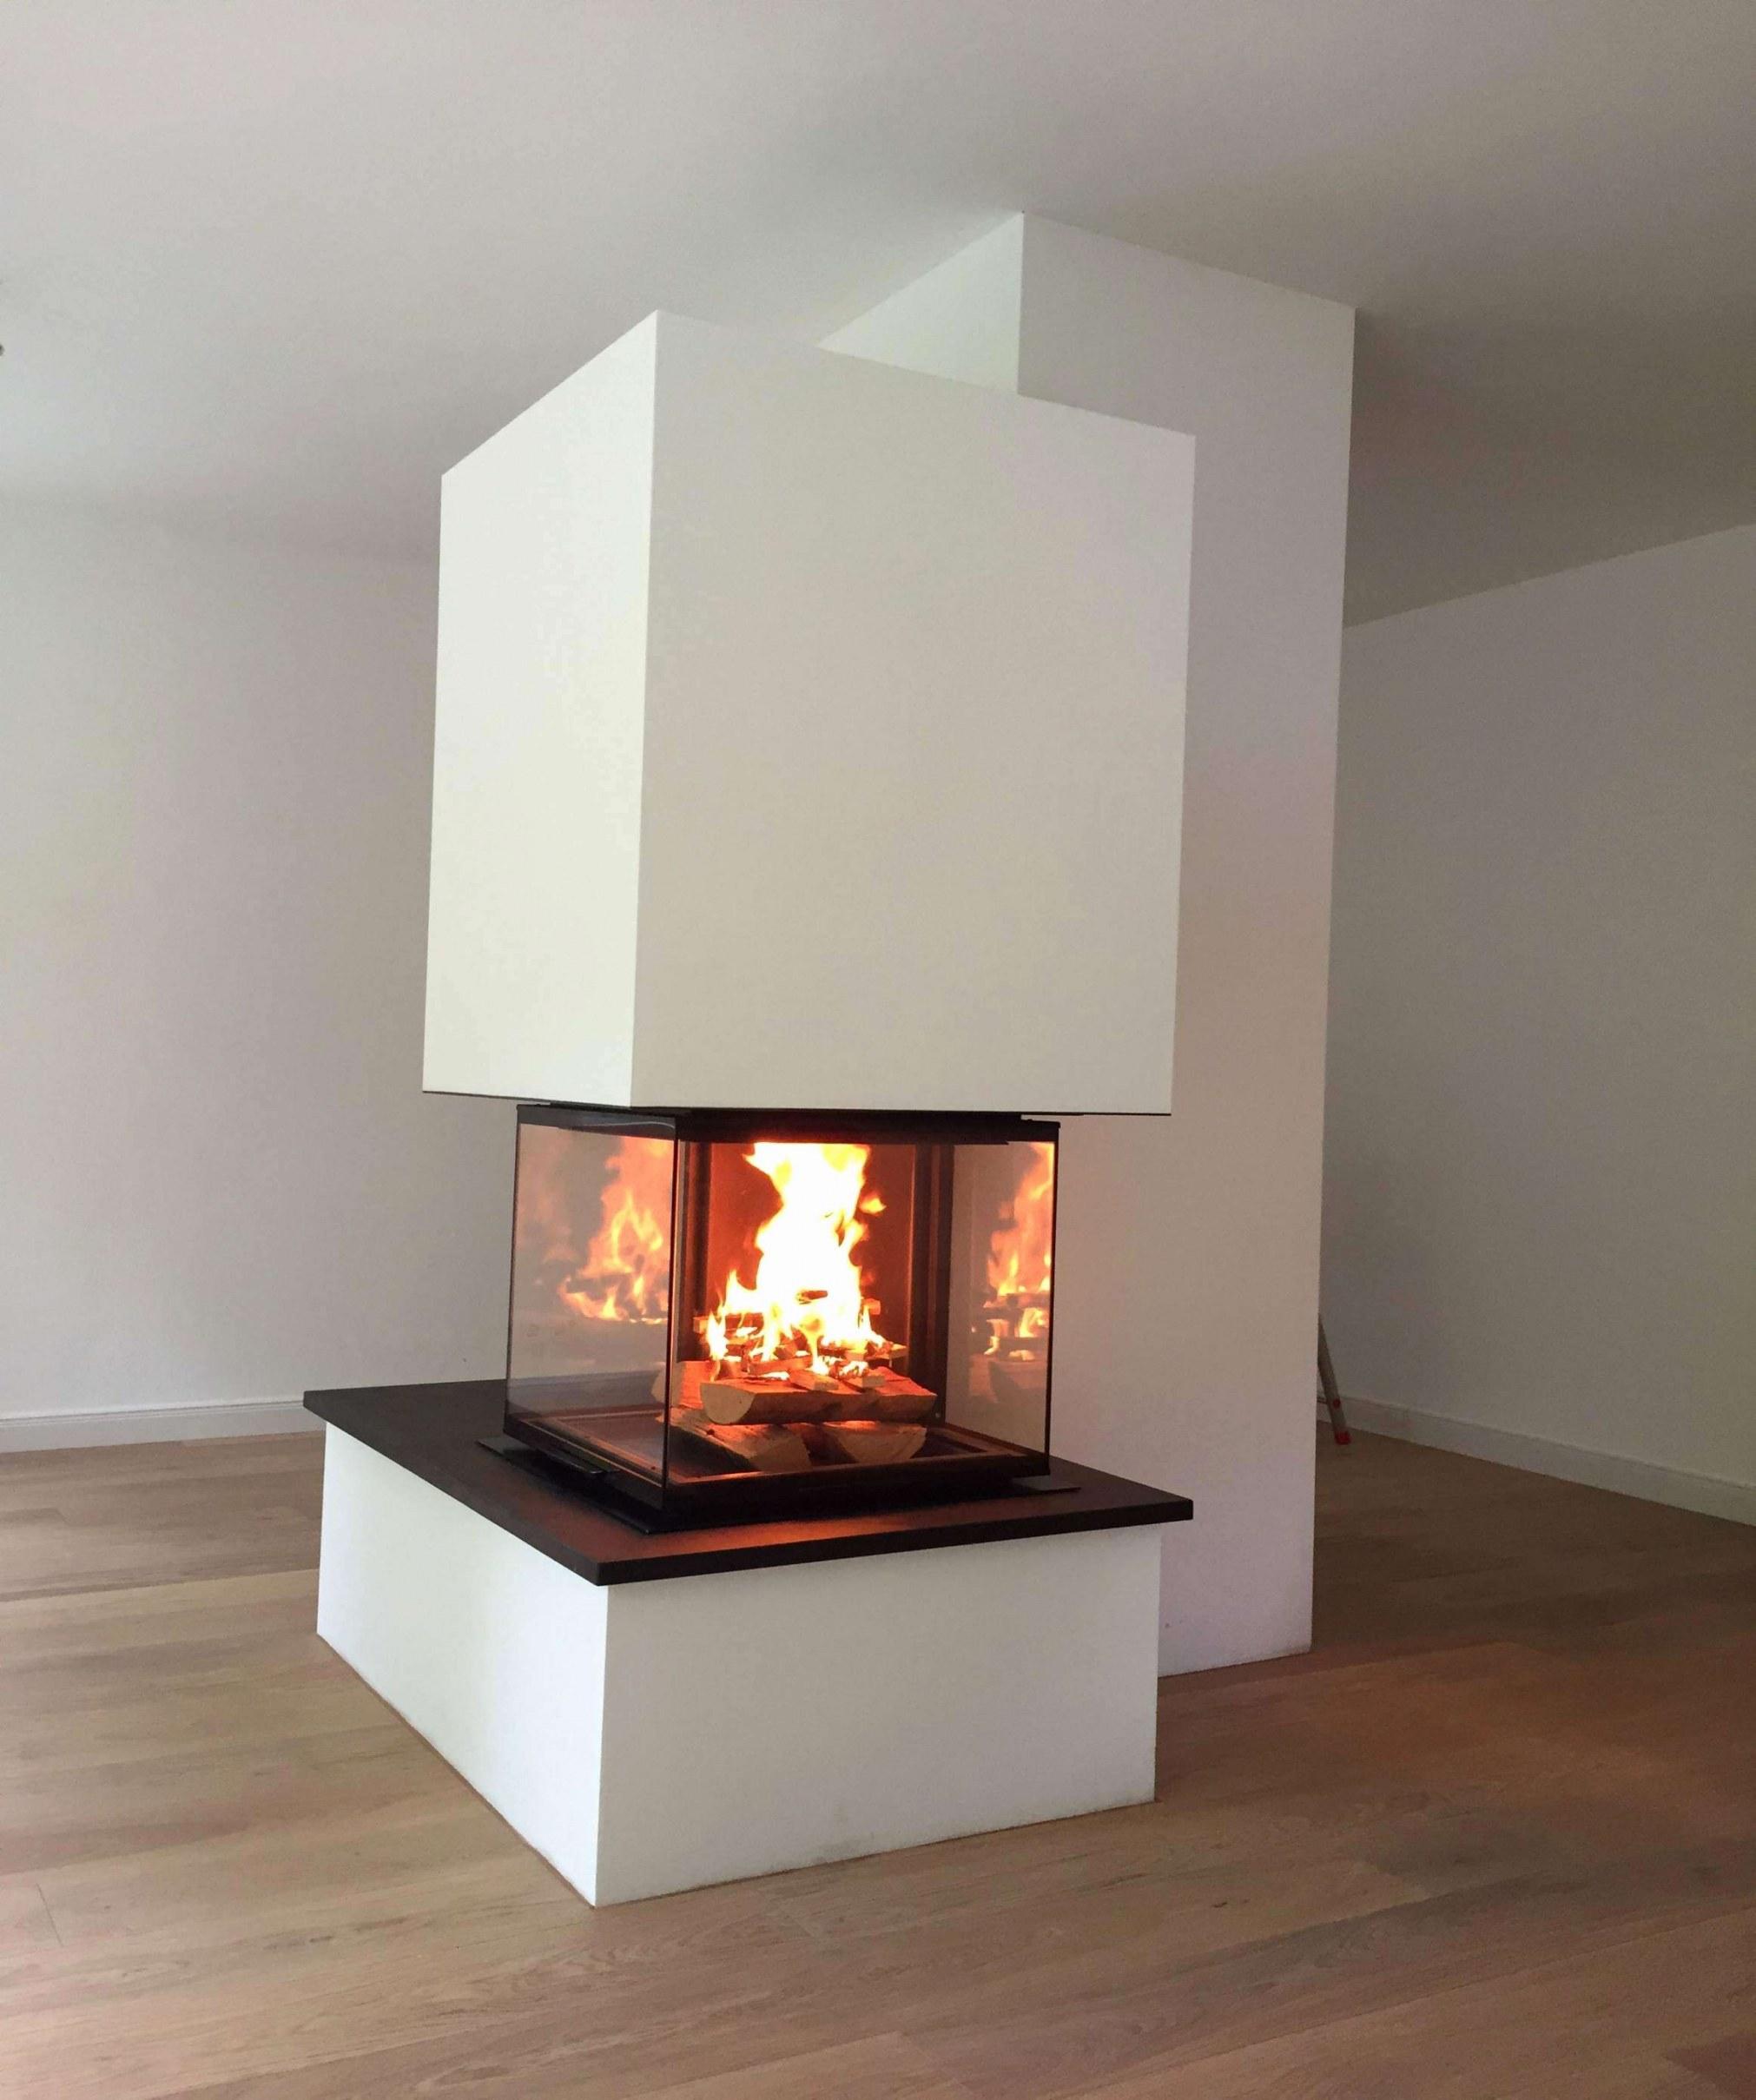 diy fireplace mantel unique modern fireplace designs of diy fireplace mantel